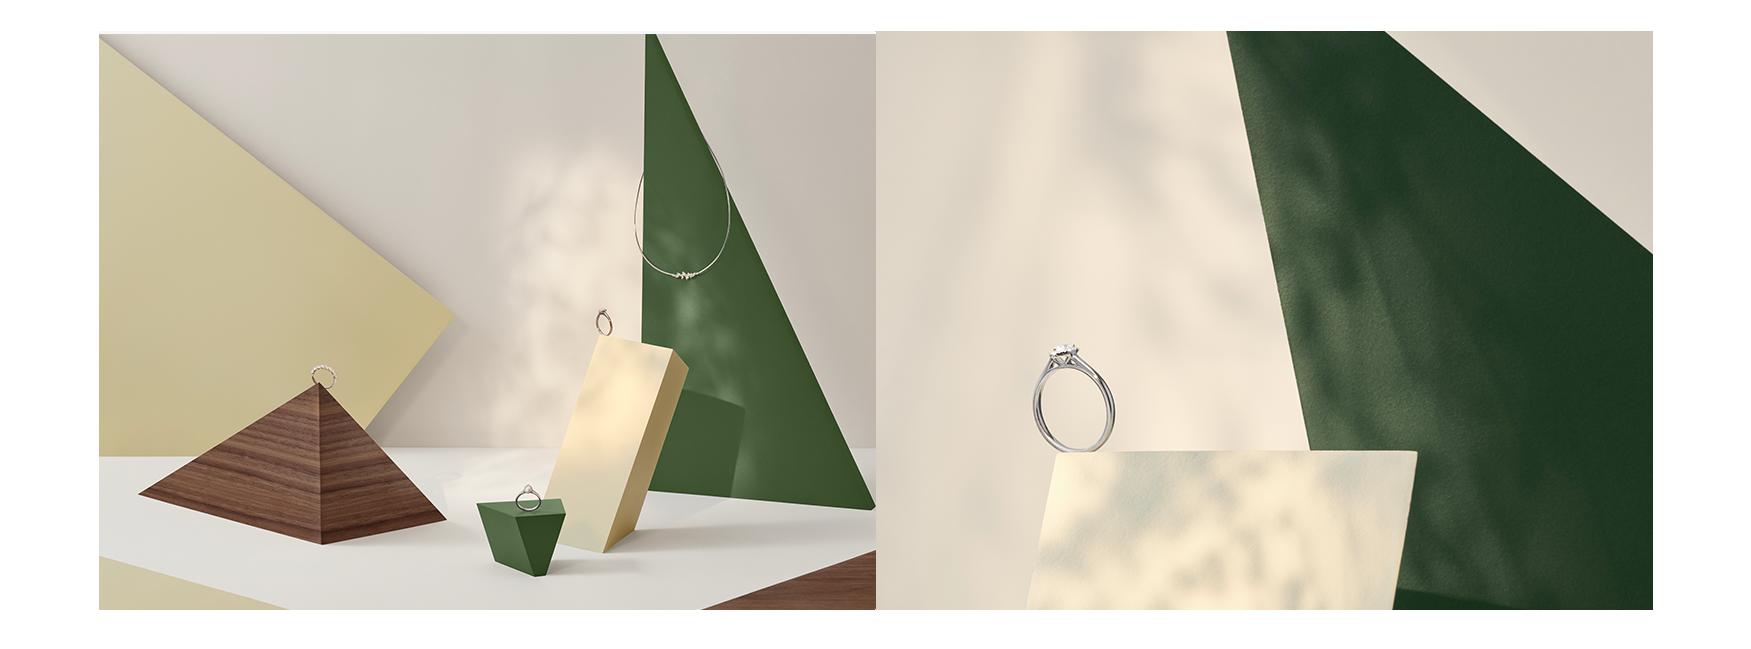 Lepage-suzanne2prints-pack-copie-7